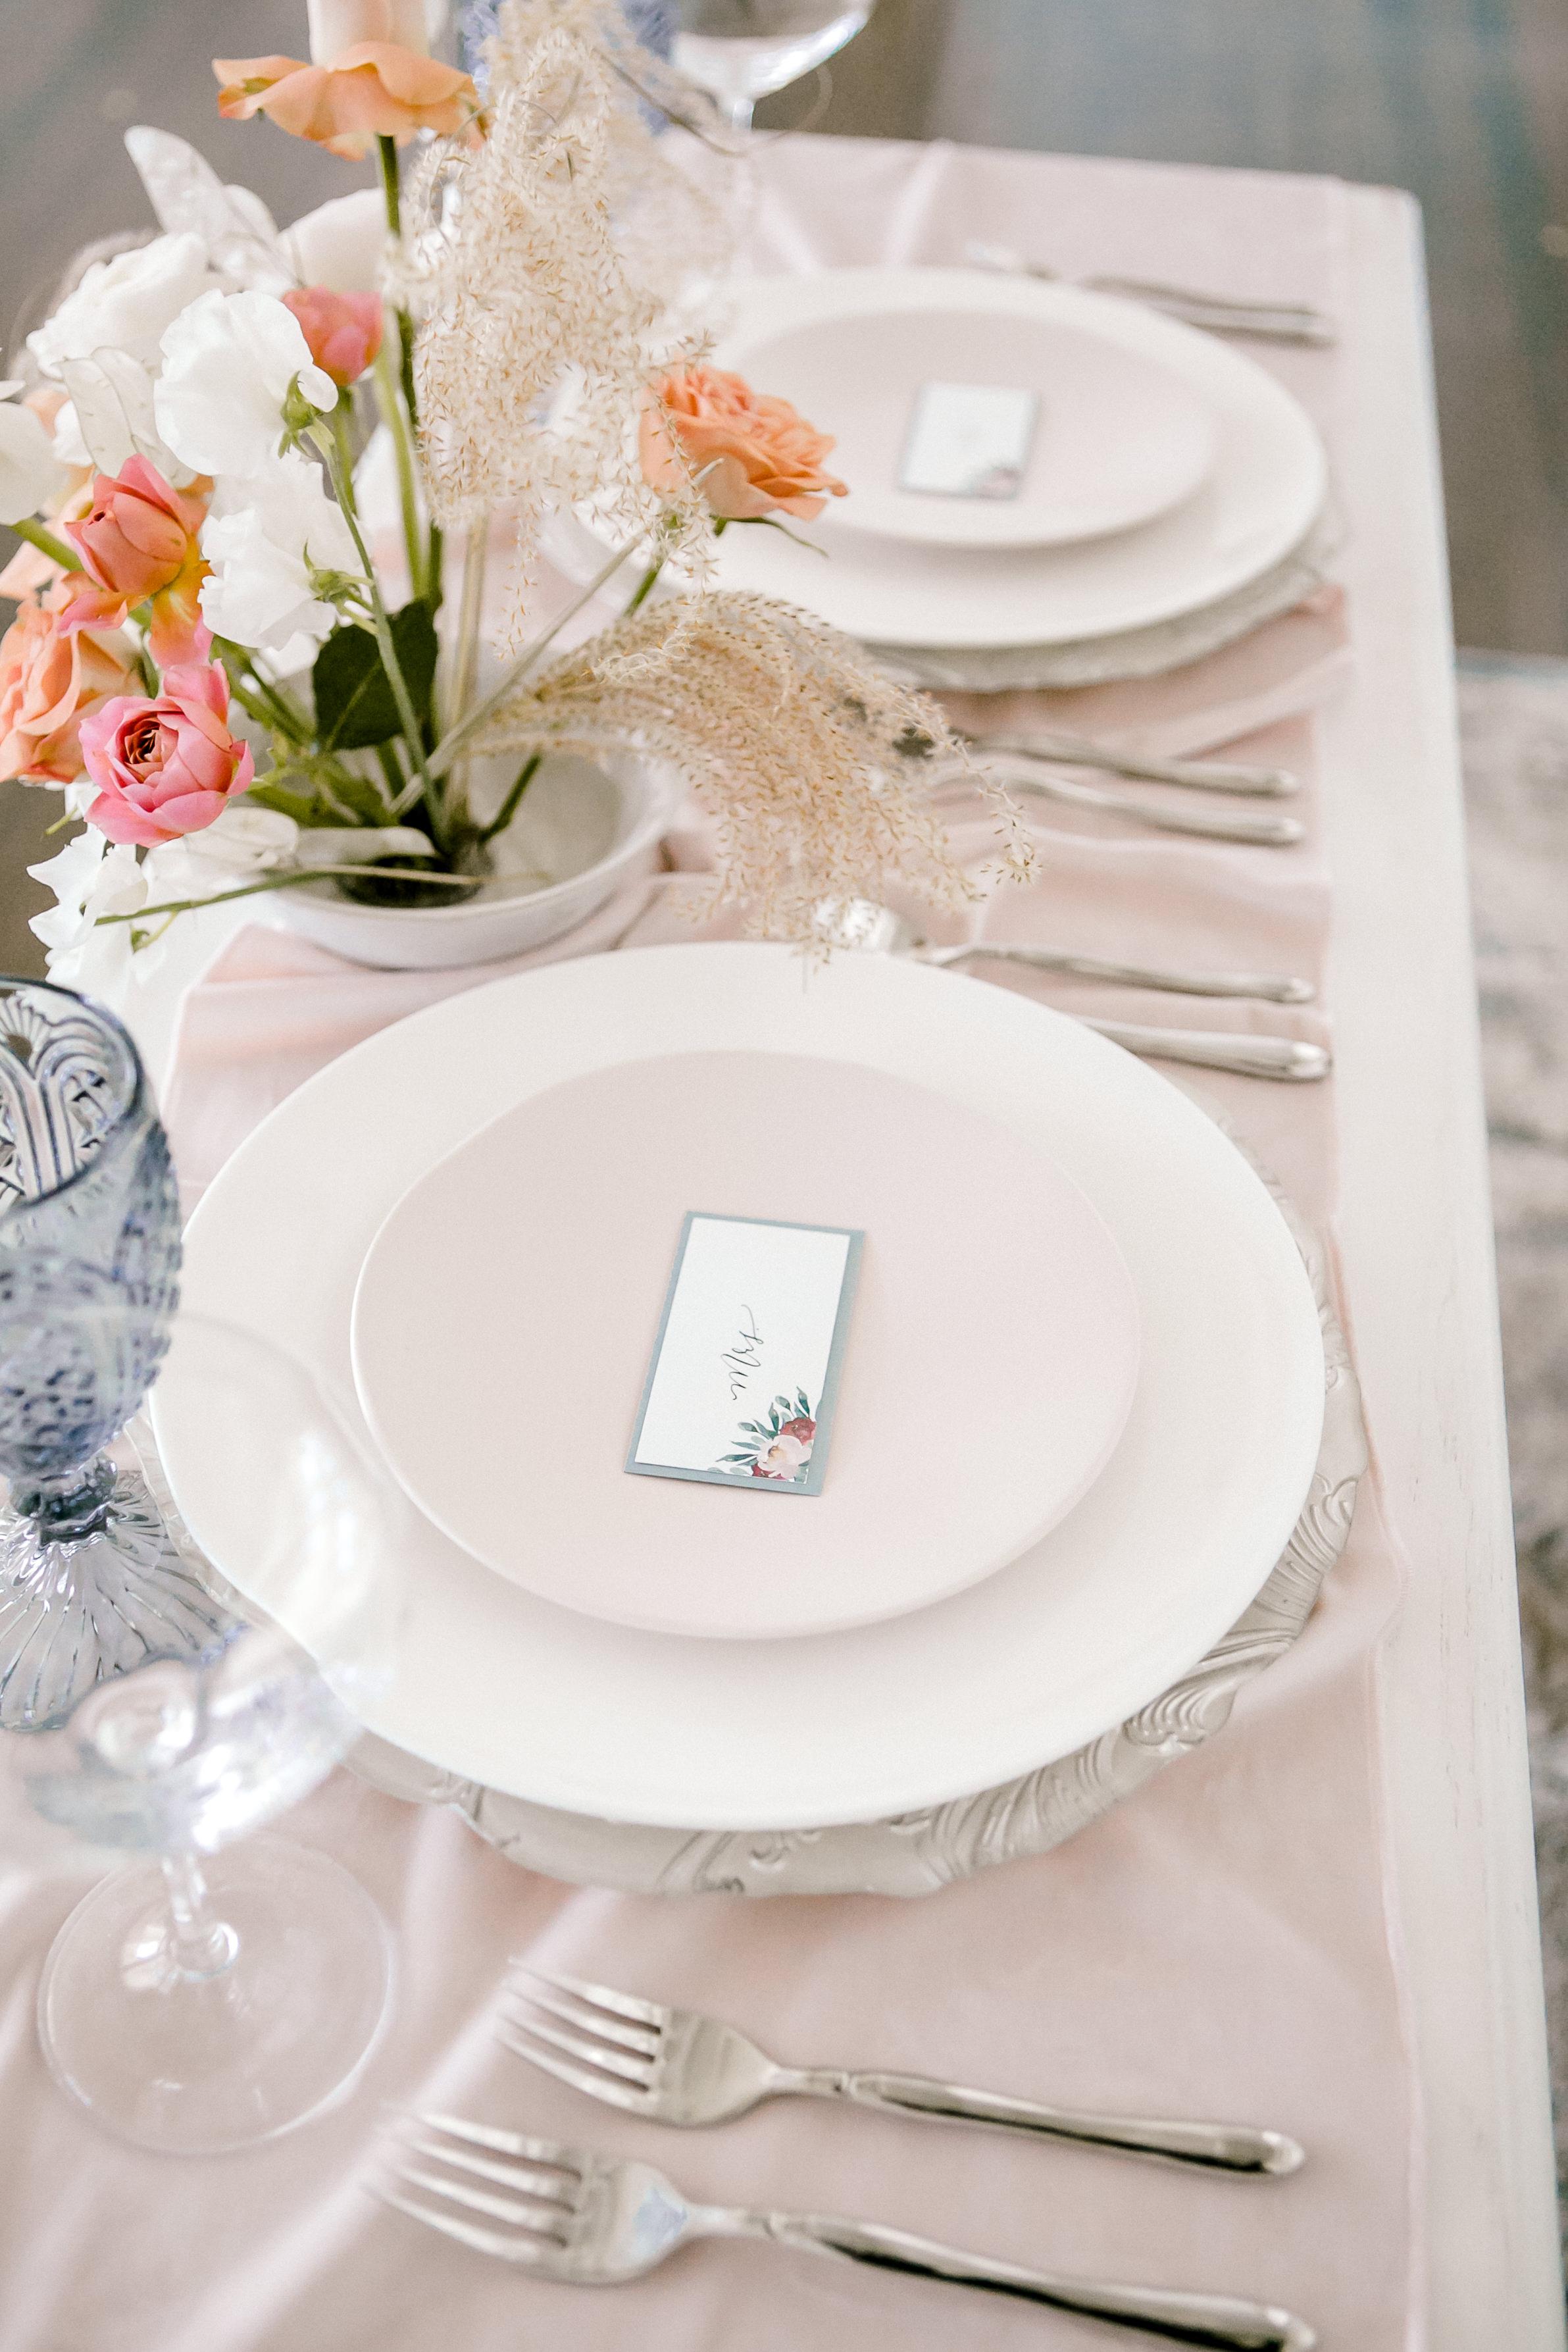 Festivities-Event-Center-Wedding-Oklahoma-City-Wedding-Photographer-Emily-Nicole-Photo-203.jpg